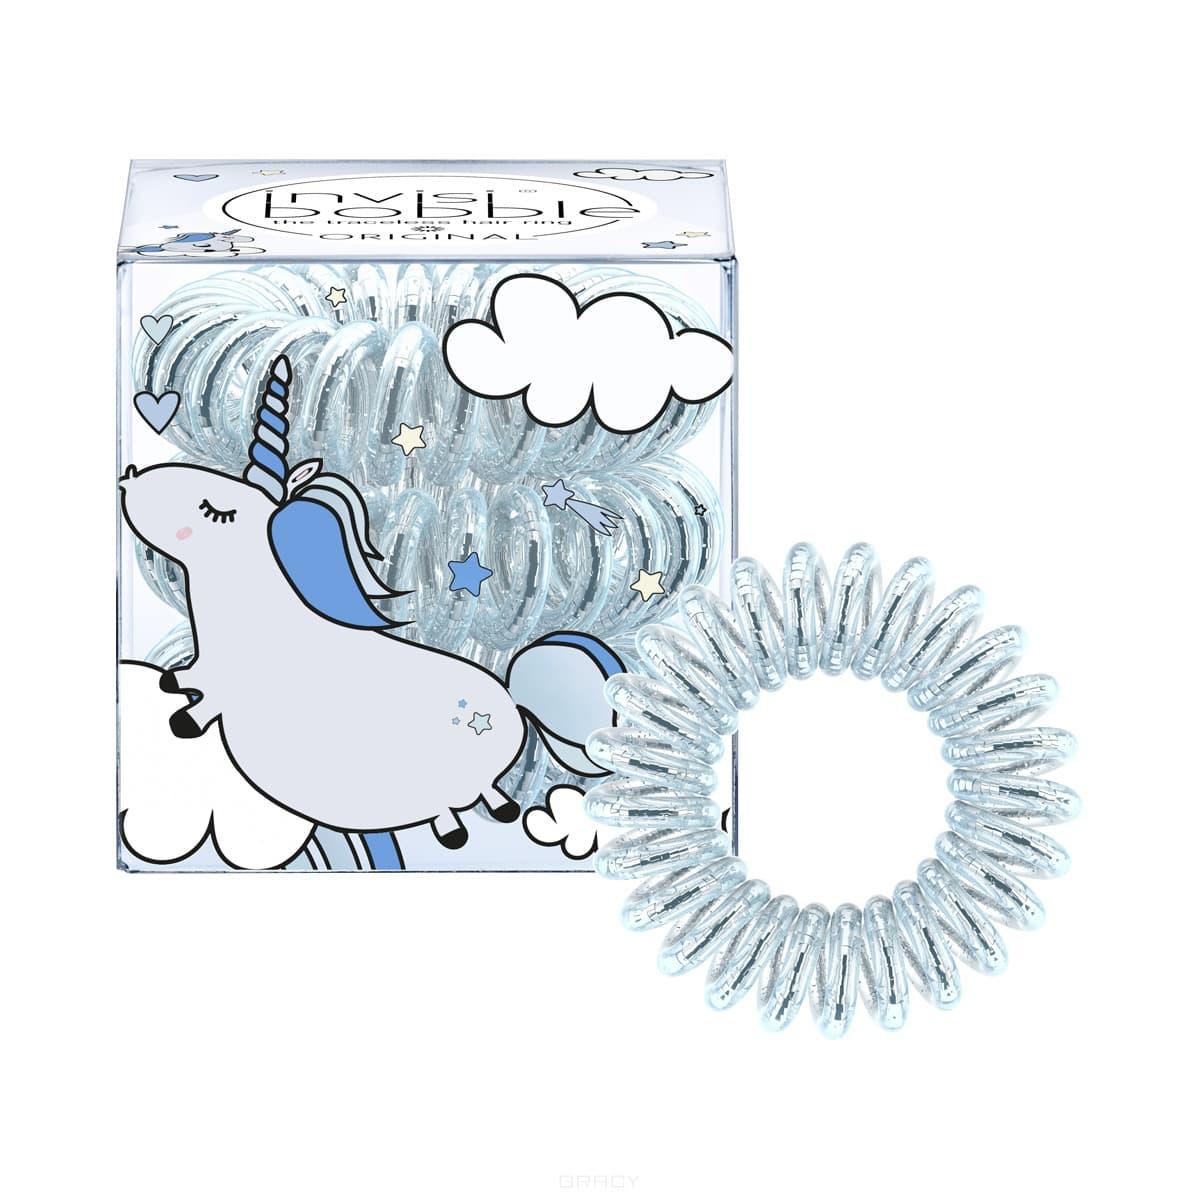 Invisibobble, Резинка для волос Original Unicorn Henry прозрачная с голубым, (3 шт.) invisibobble резинка для волос кораллового цвета original fancy flamingo 3 шт резинка для волос кораллового цвета original fancy flamingo 3 шт 3 шт уп